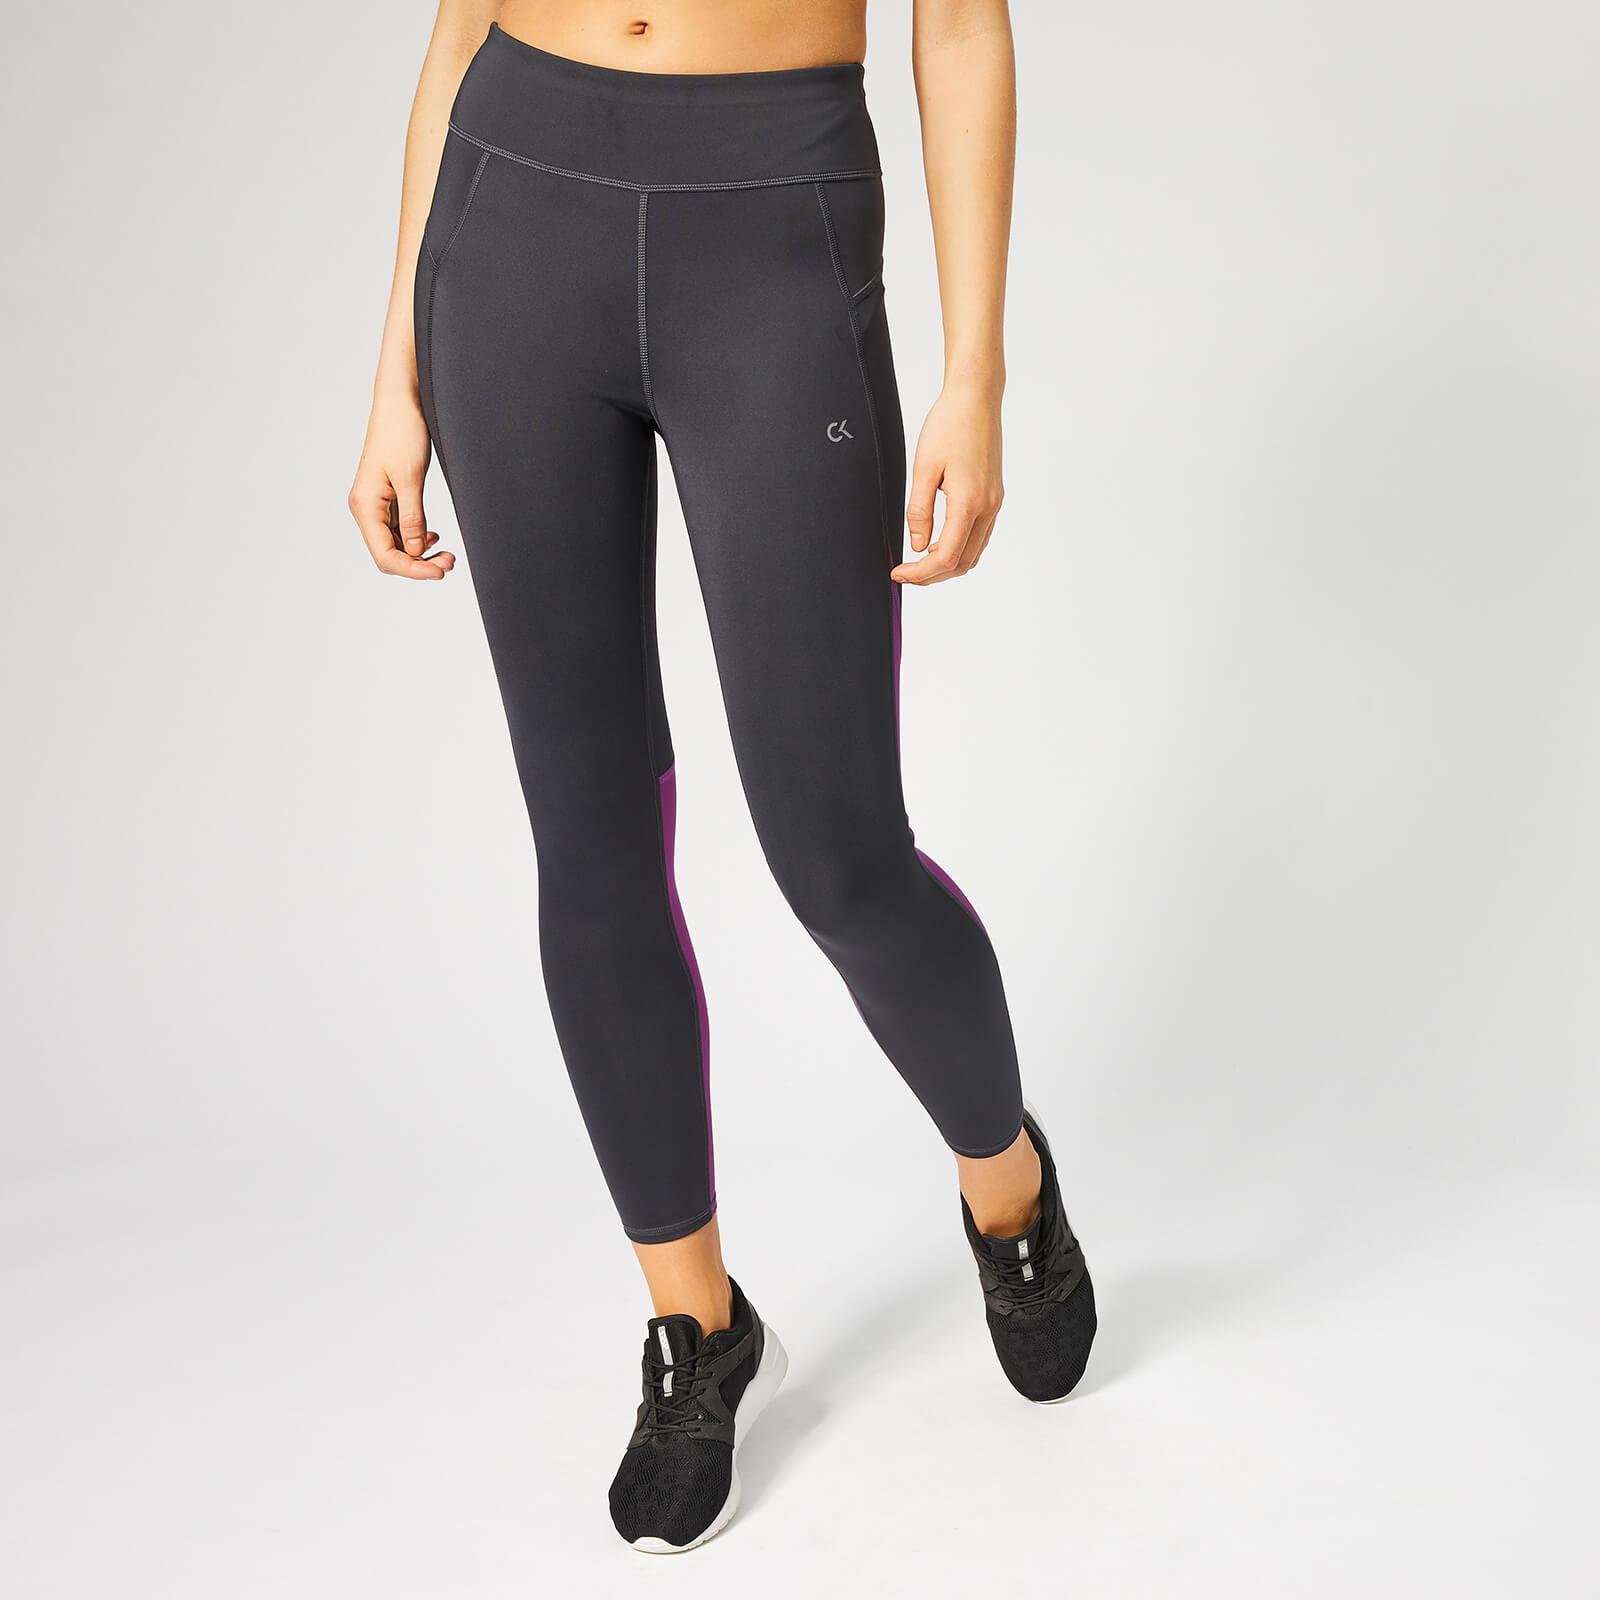 4974ce5157b85b Calvin Klein Performance Women's 7/8 Tights - Gunmetal/Sparkling Grape  Sports & Leisure | TheHut.com